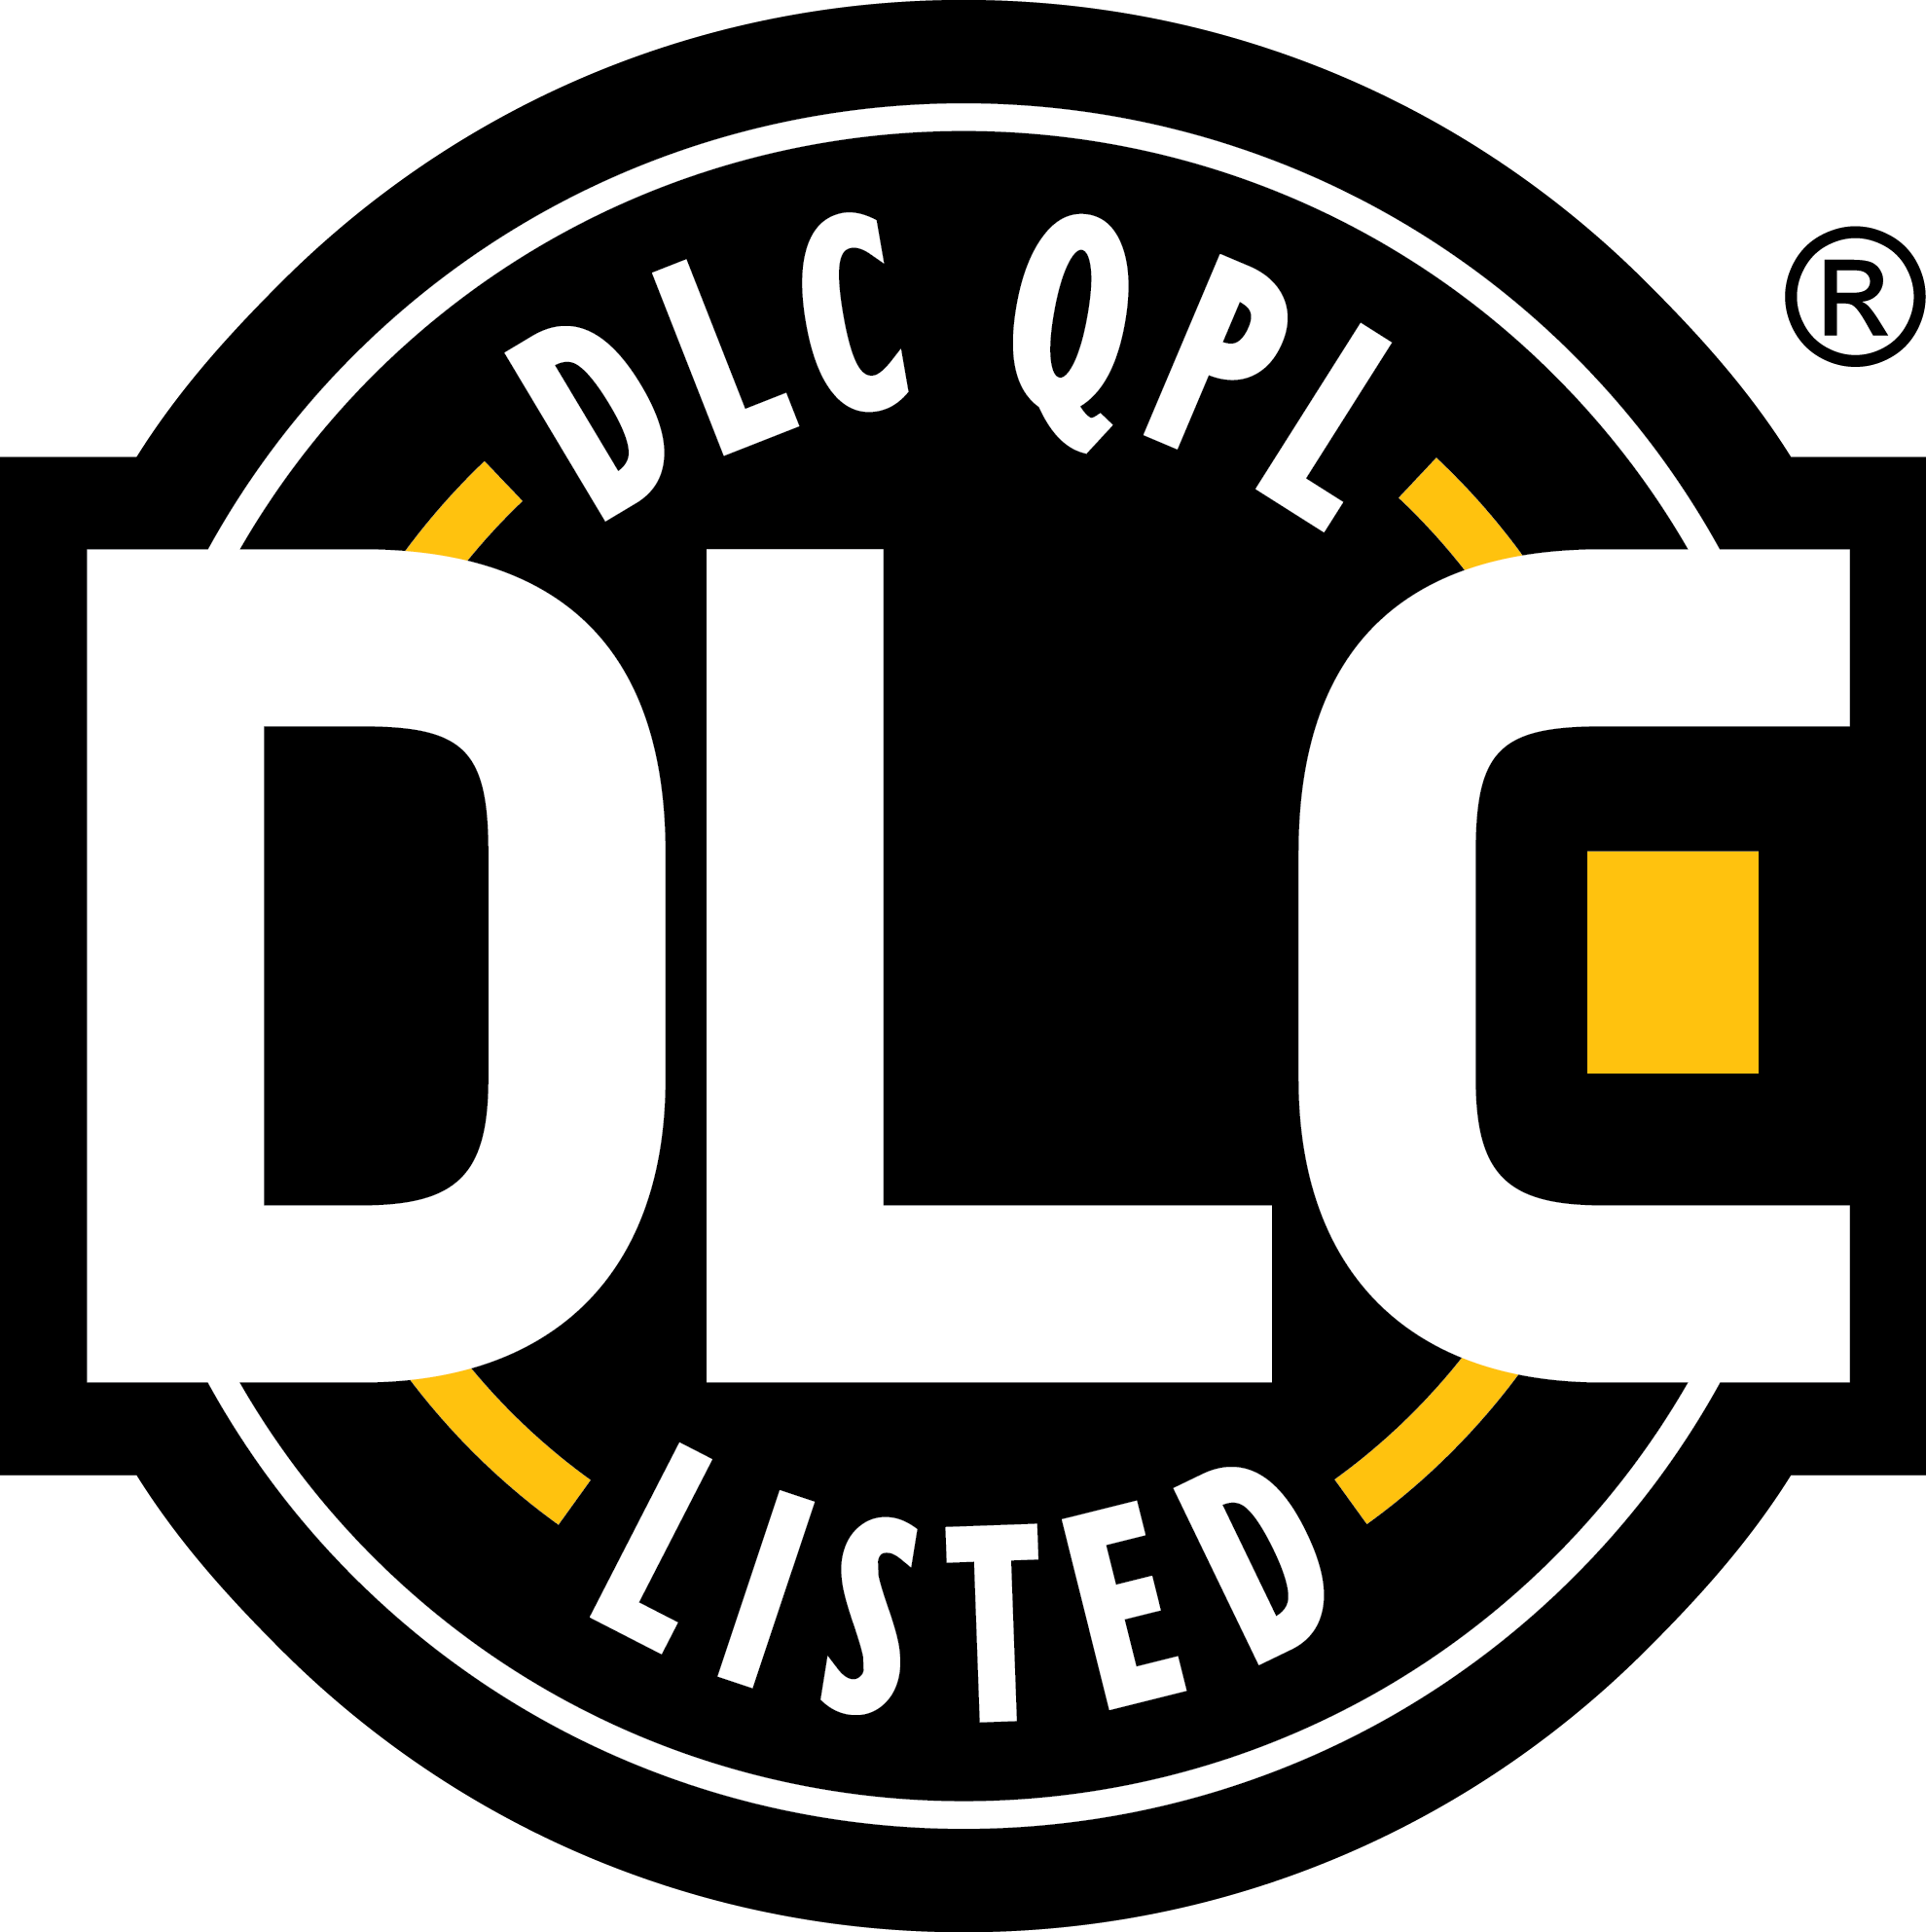 Dlc_listed